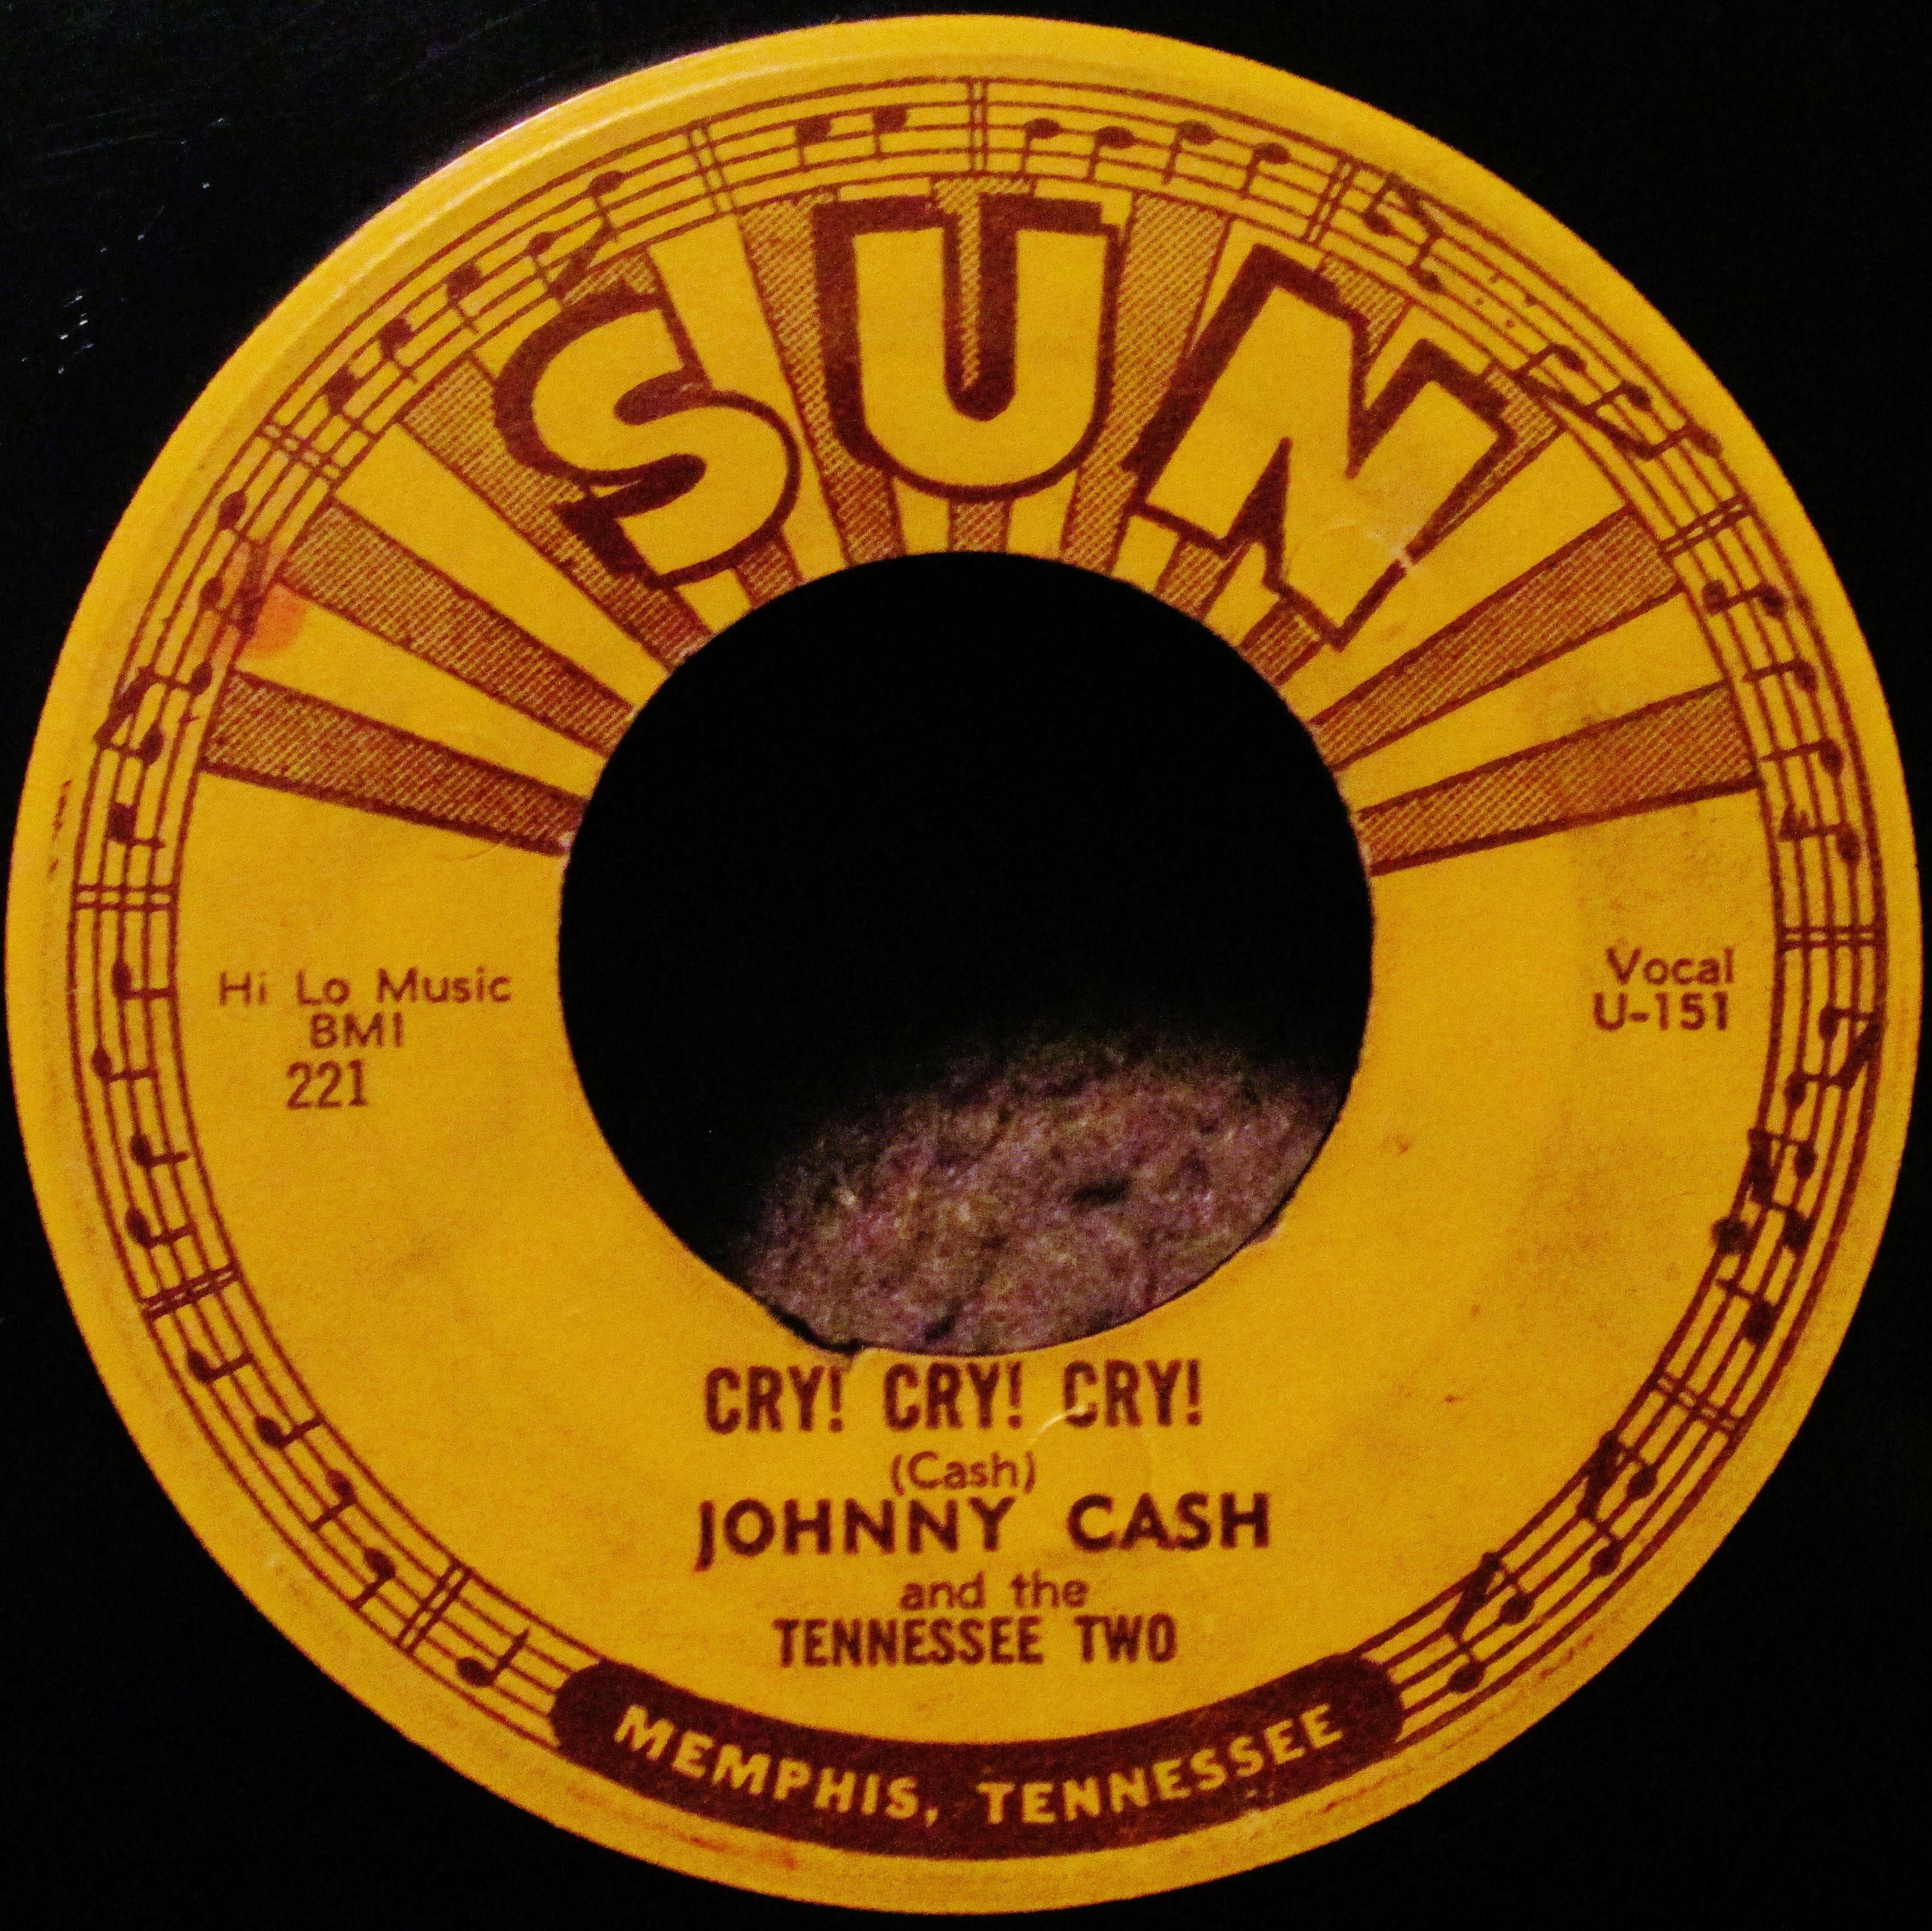 Johnny Cash Cry! Cry! Cry! Sun Records (1955) | Sun records ...